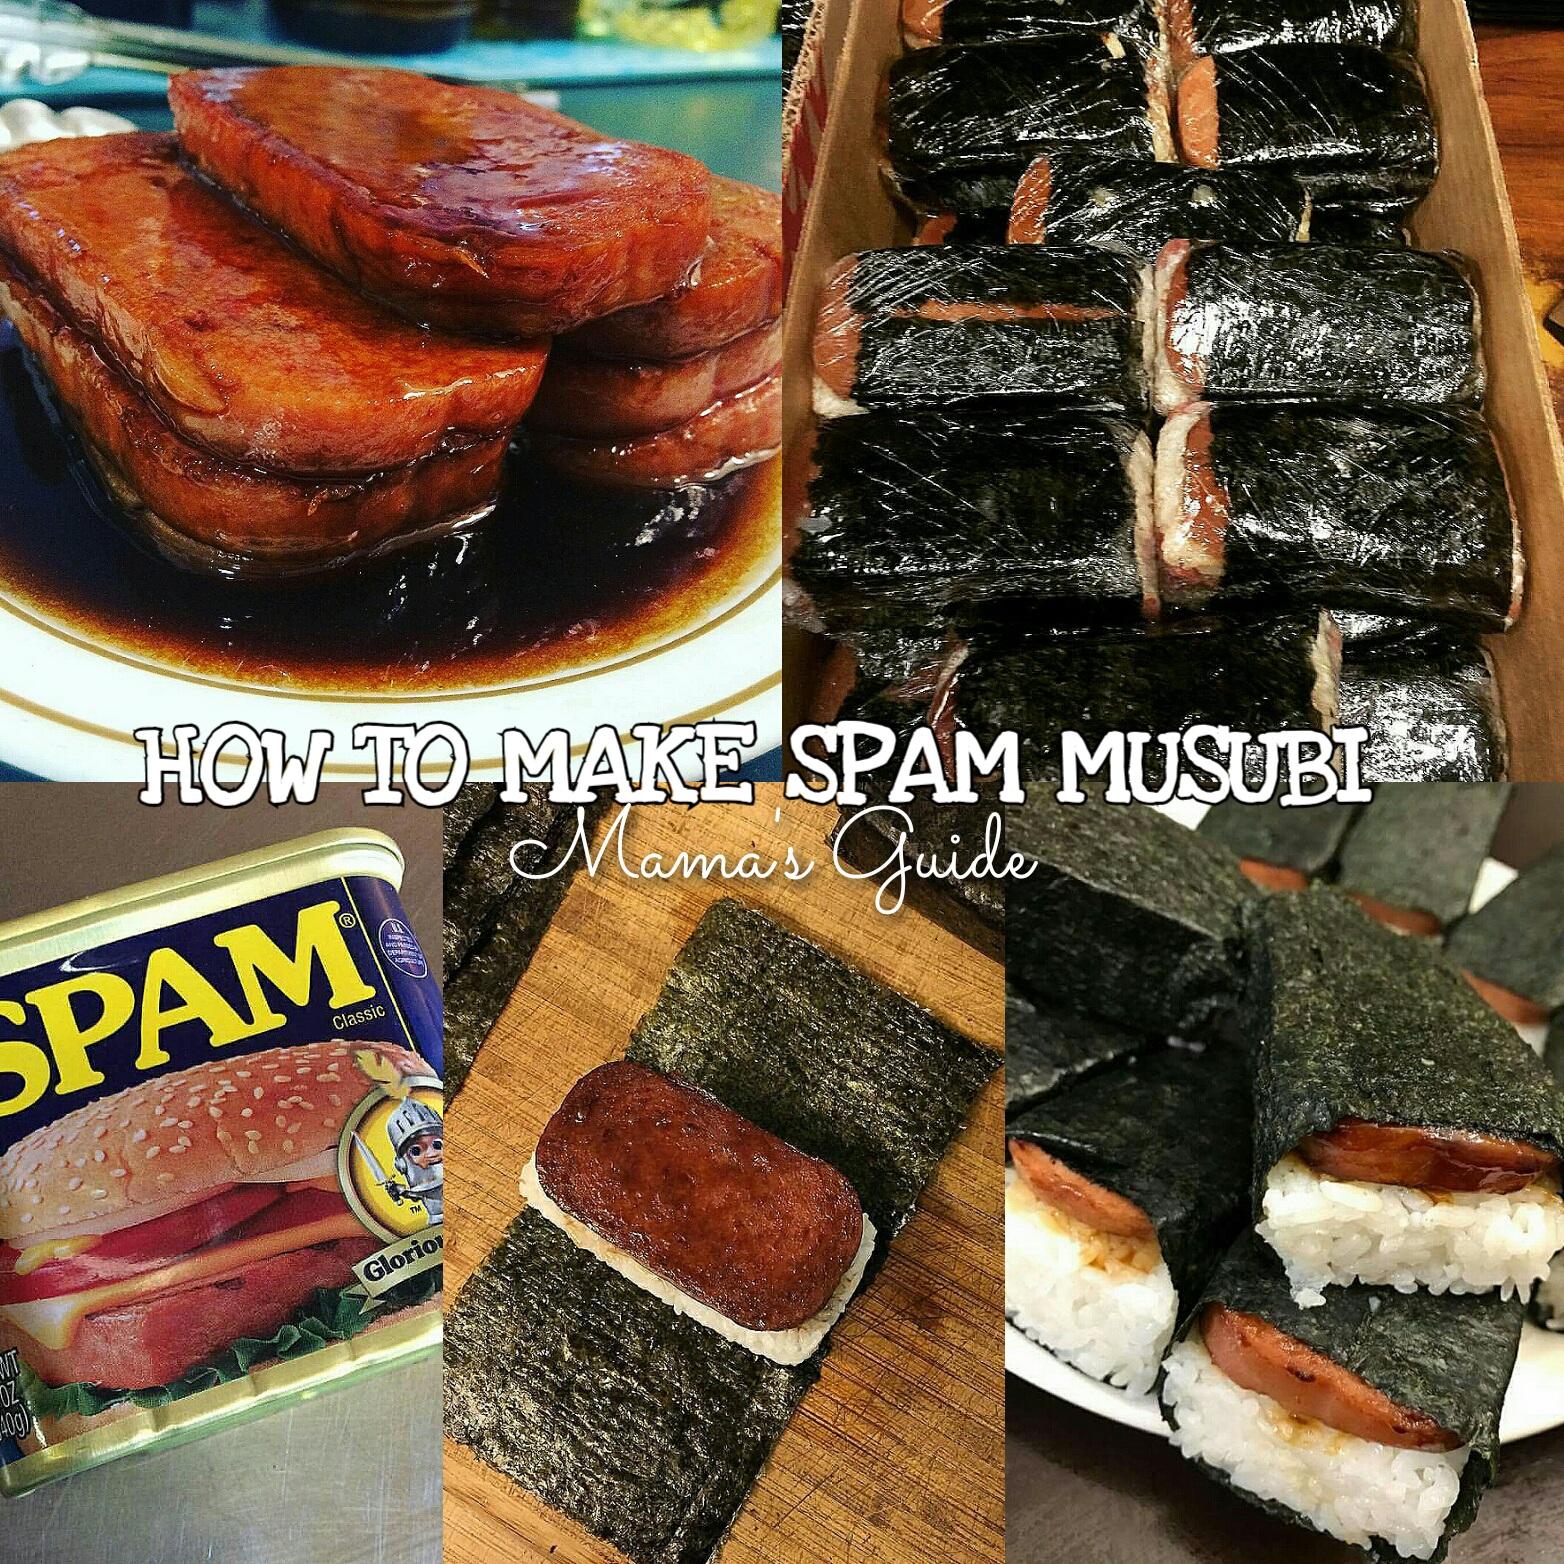 HOW TO MAKE SPAM MUSUBI